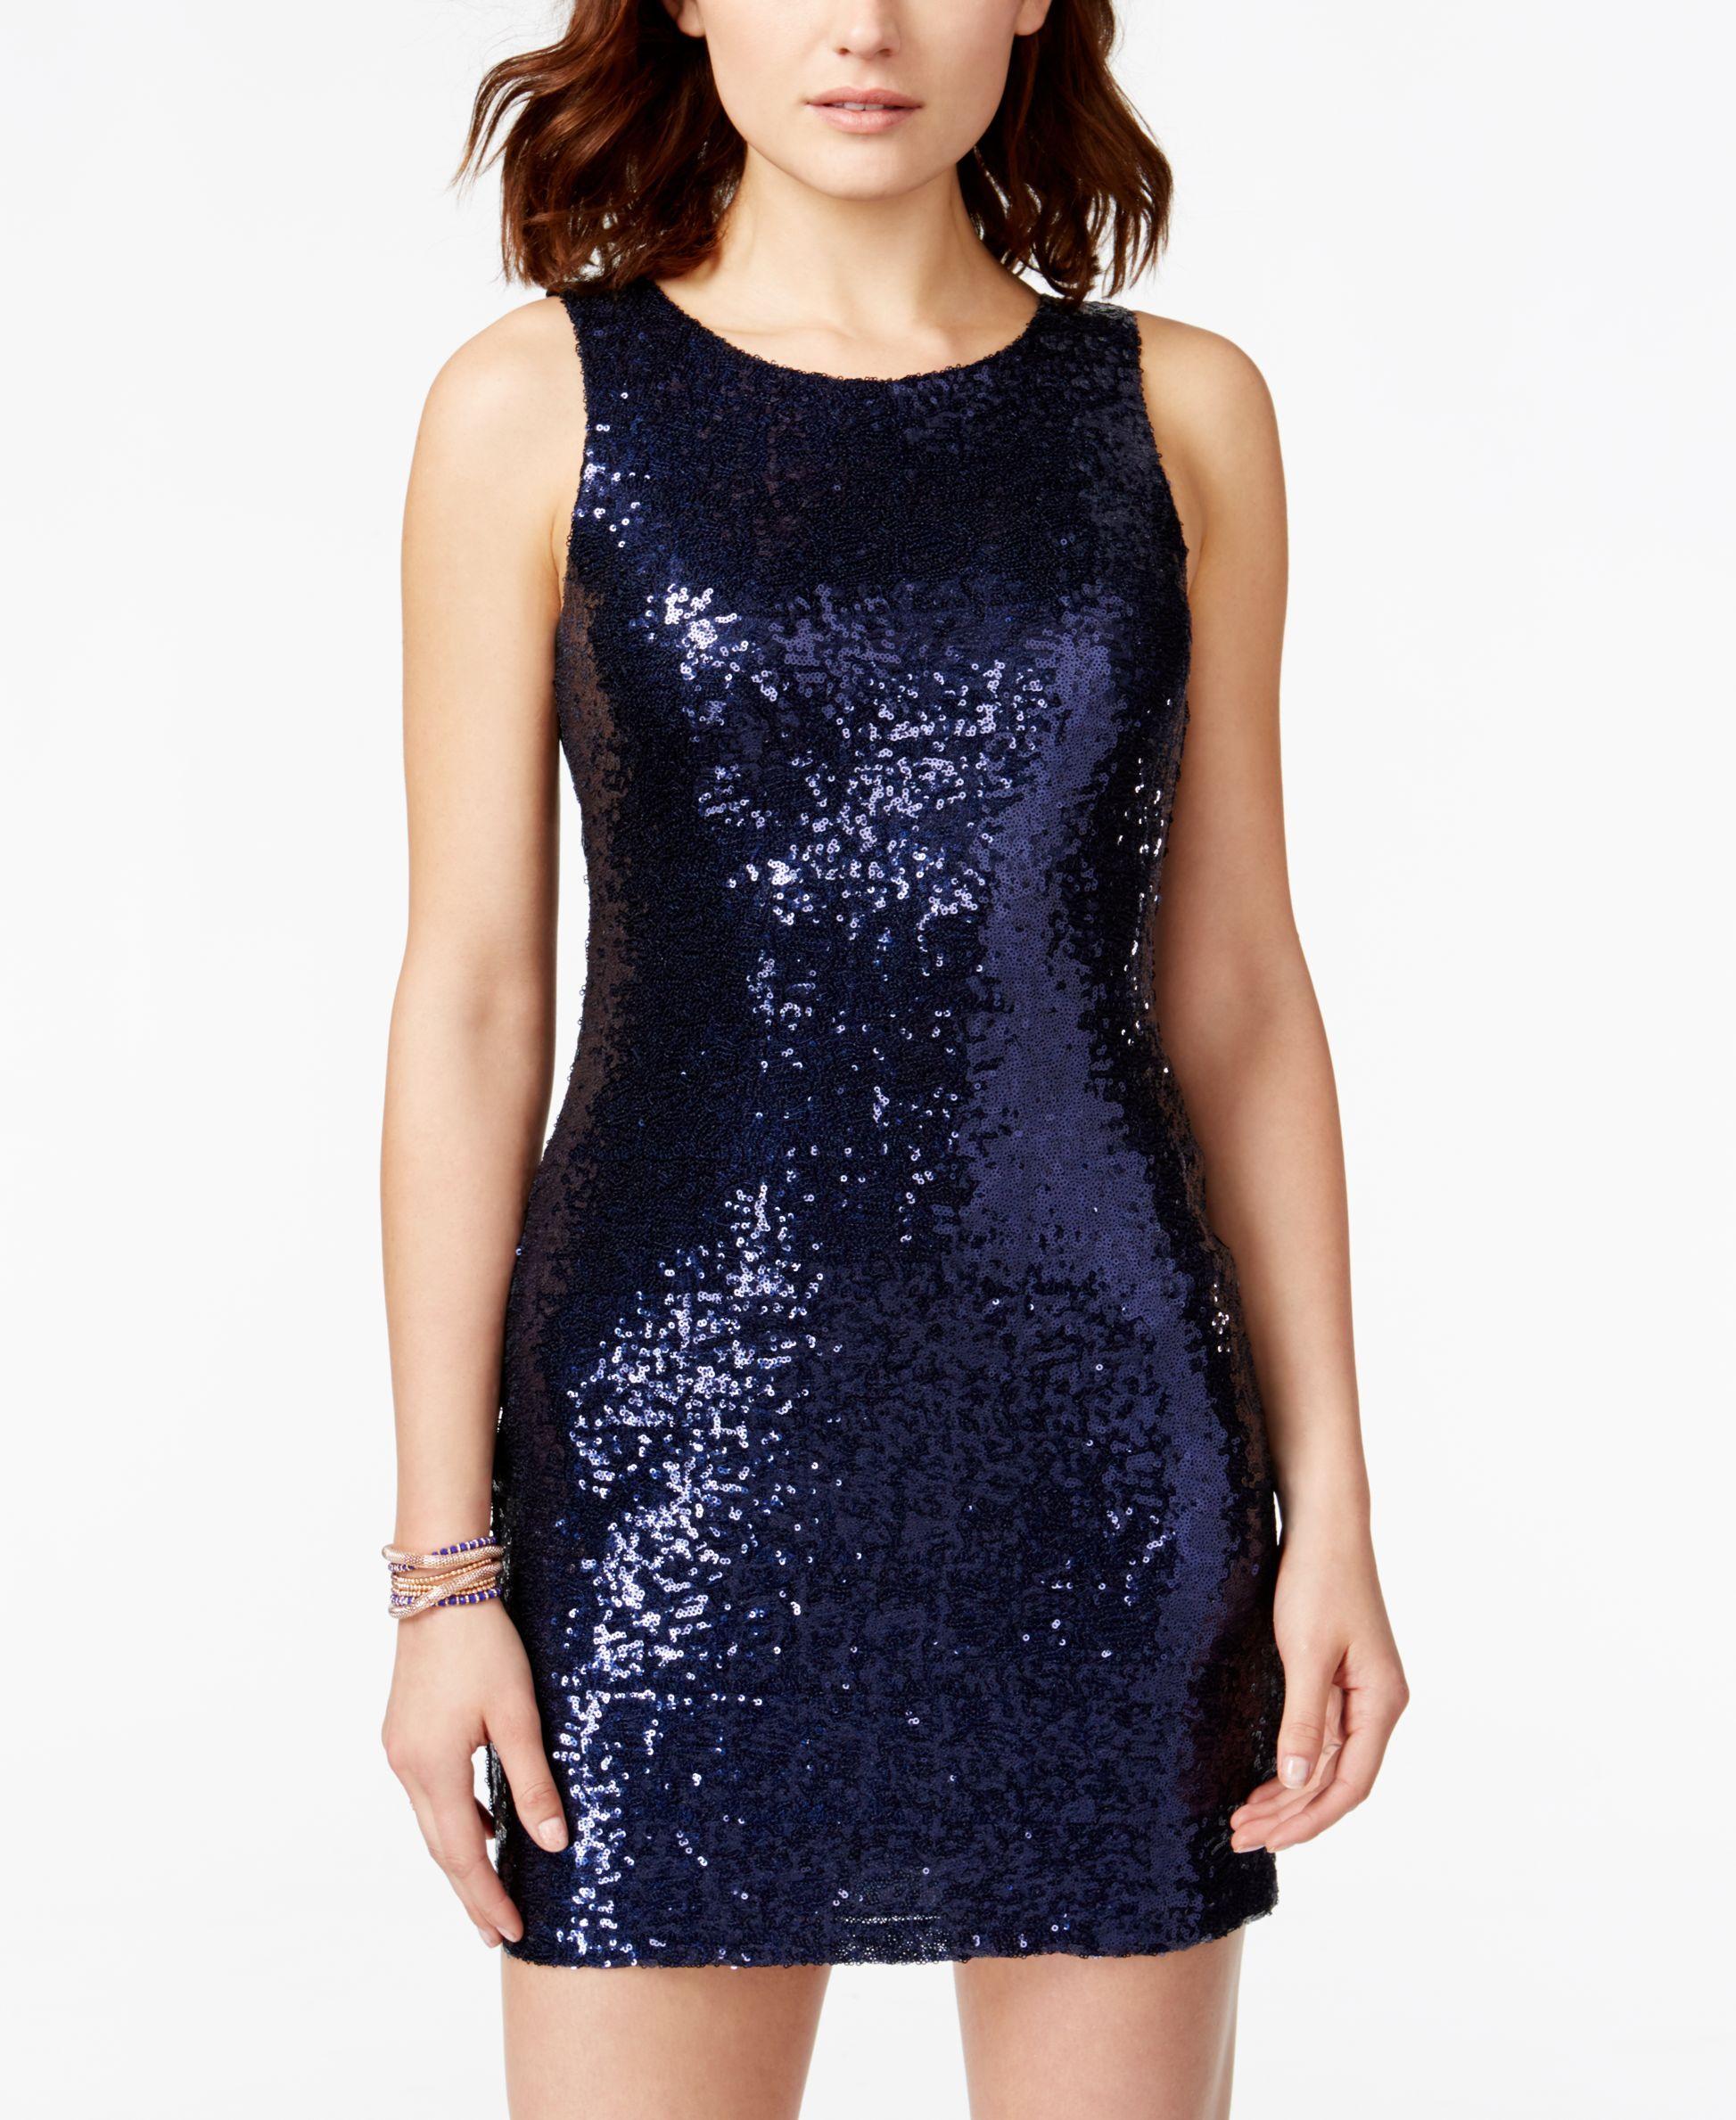 61926b32de34e Crystal Doll Juniors' Sequin Bodycon Tank Dress | Dress | Dresses ...